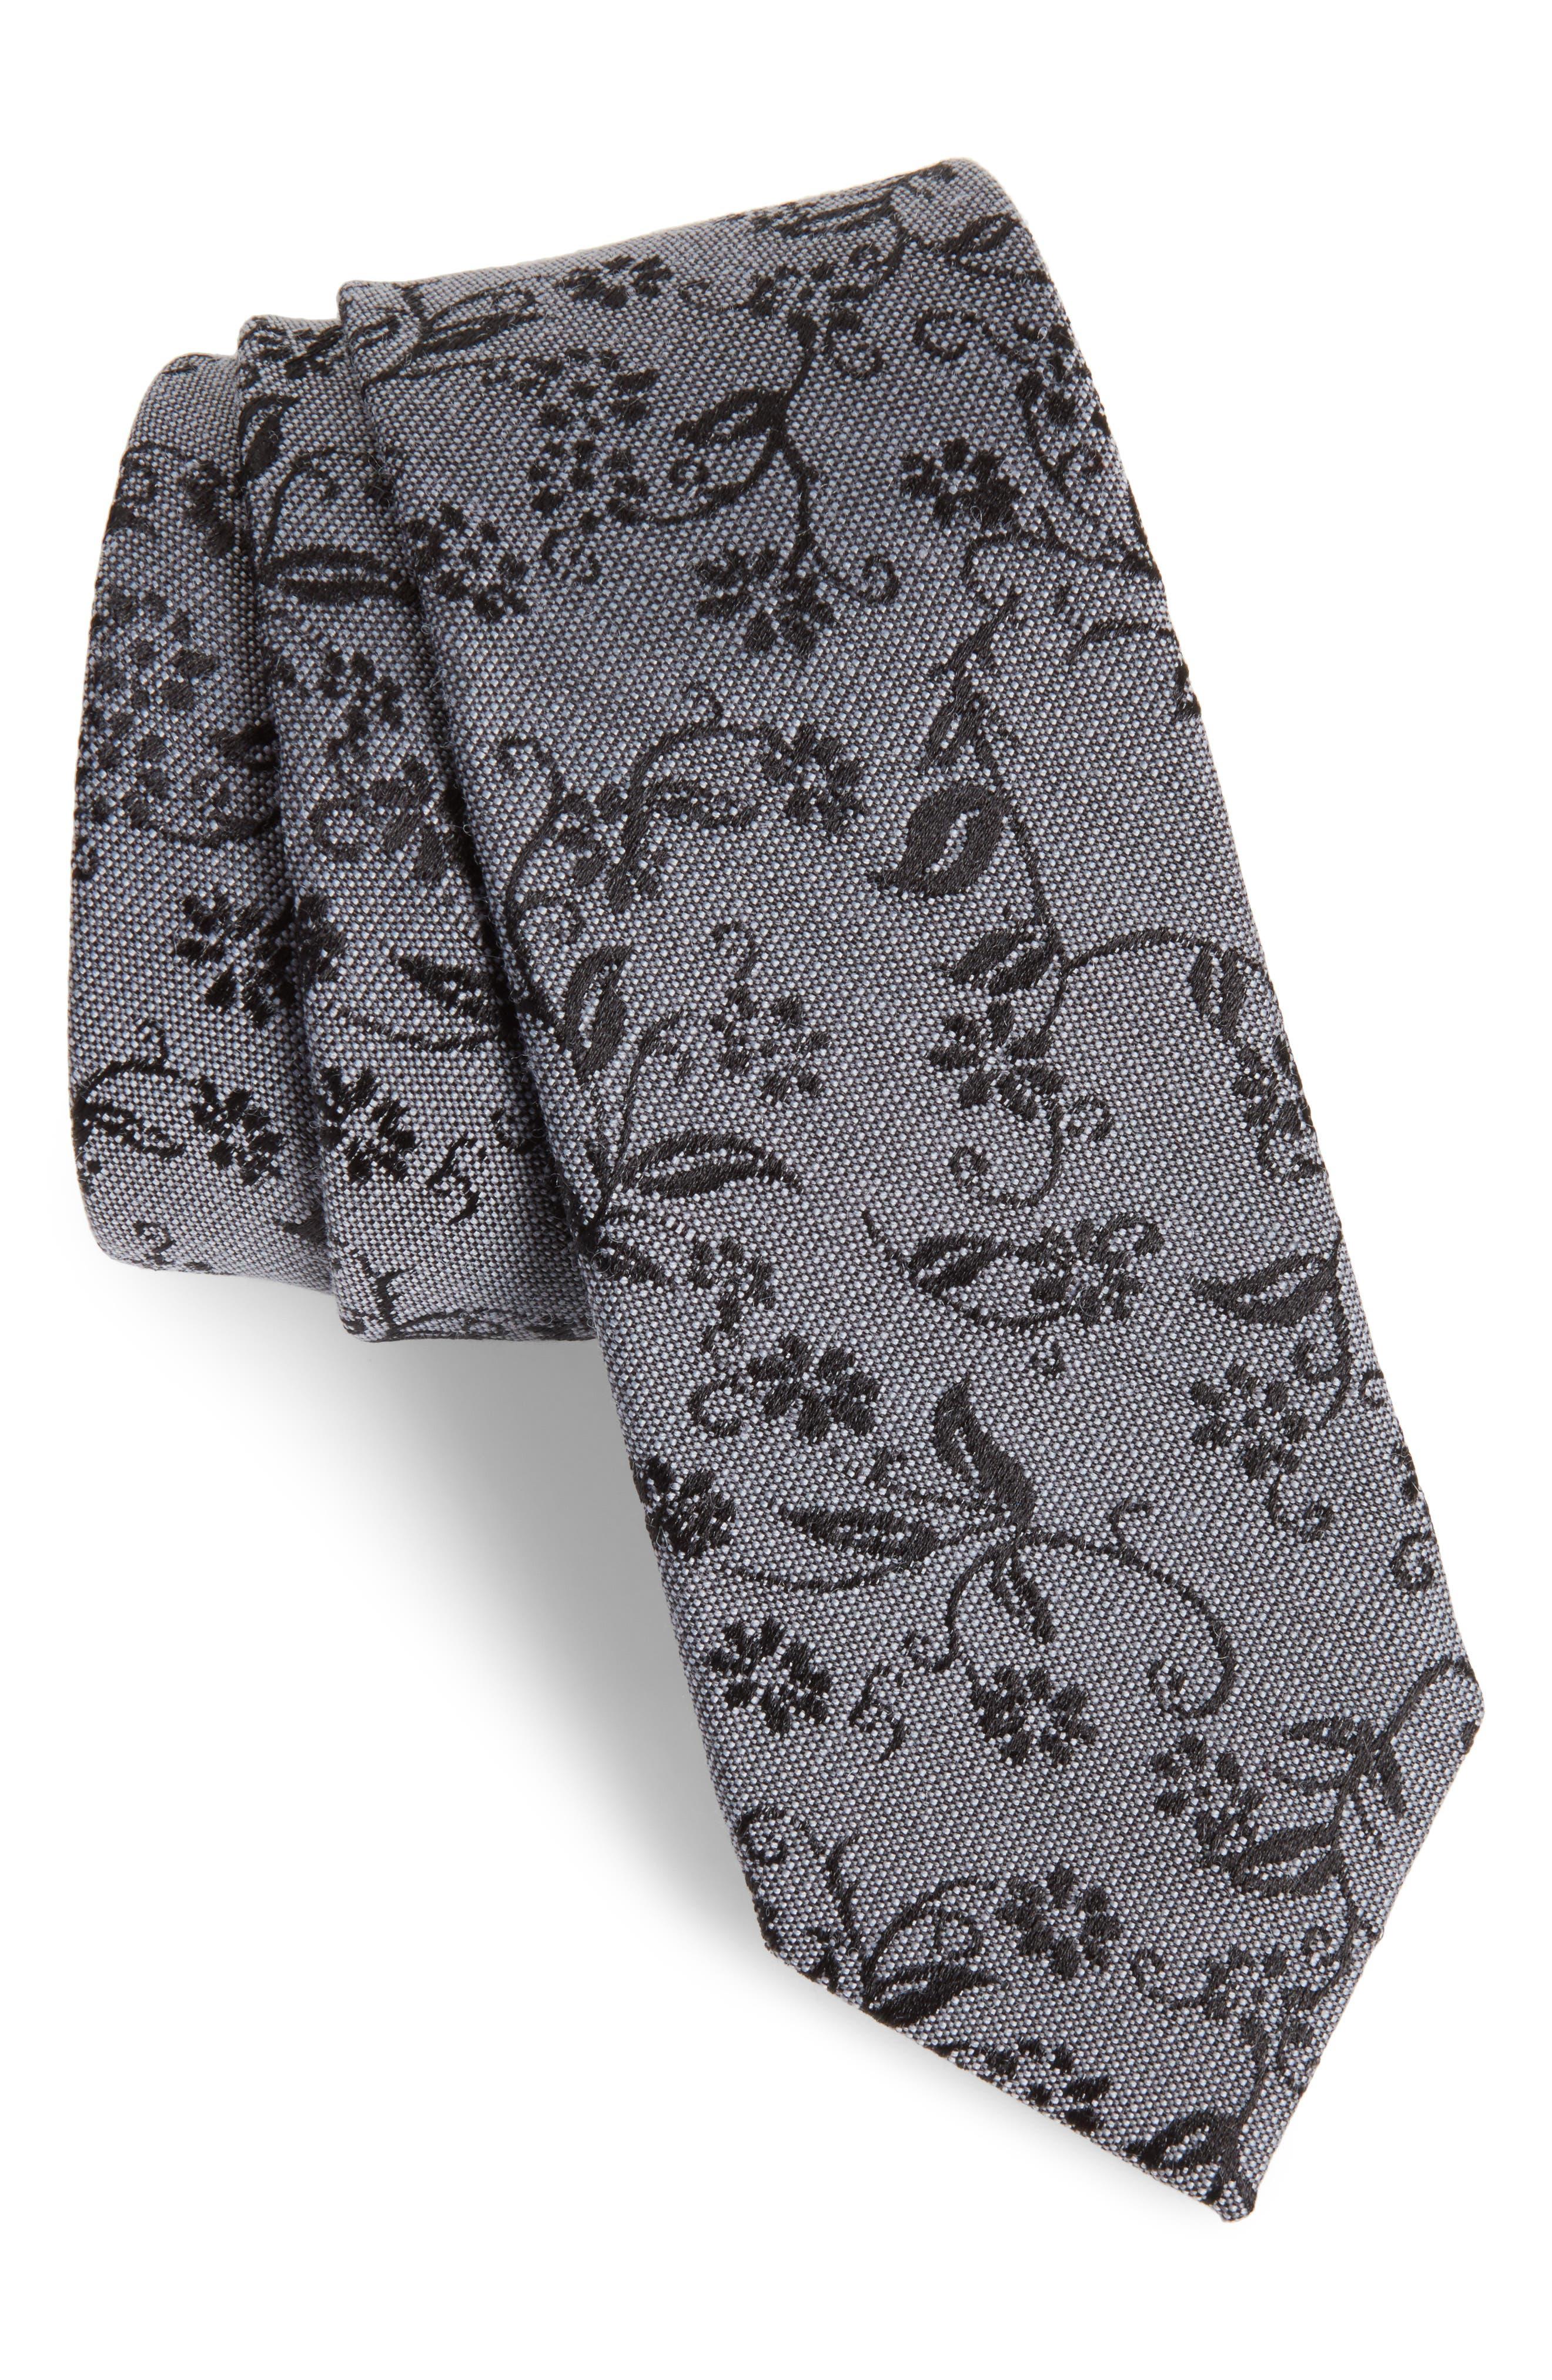 Main Image - Nordstrom Men's Shop Emerson Floral Wool & Silk Tie